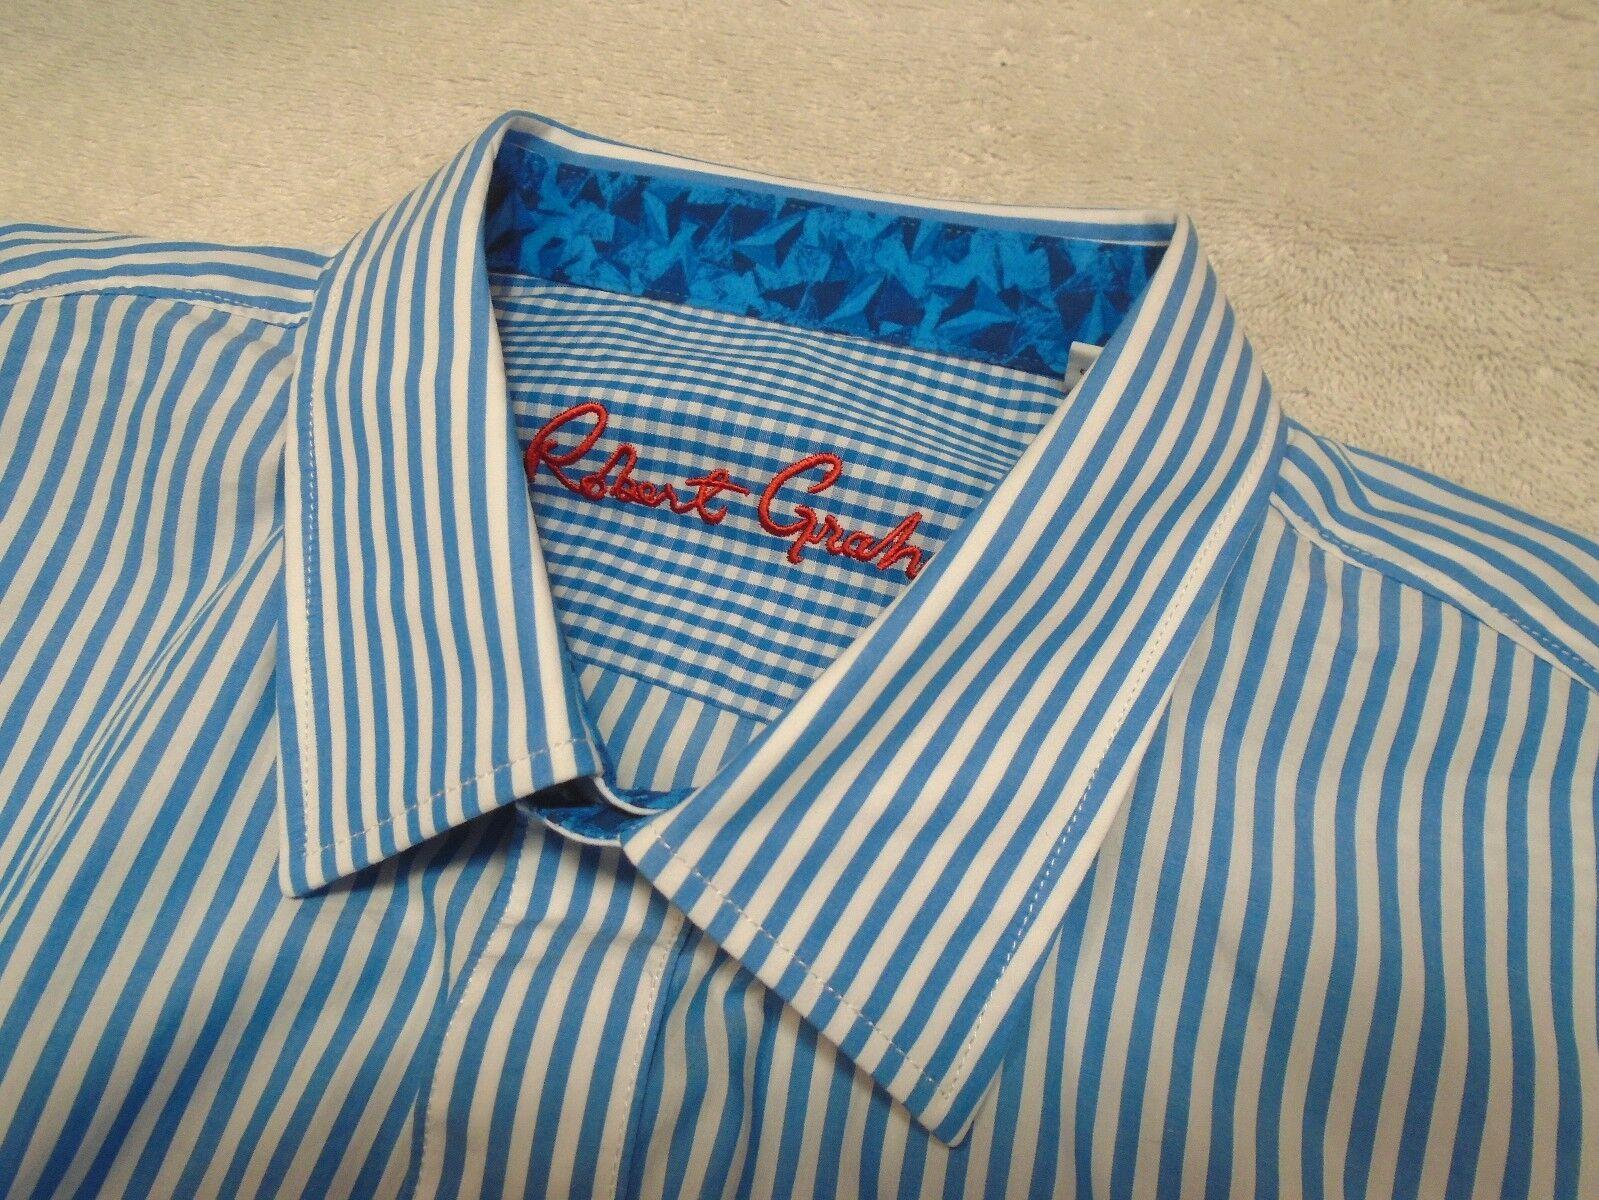 Robert Graham Benedetto bluee & White Striped Sport Shirt NWT  XL